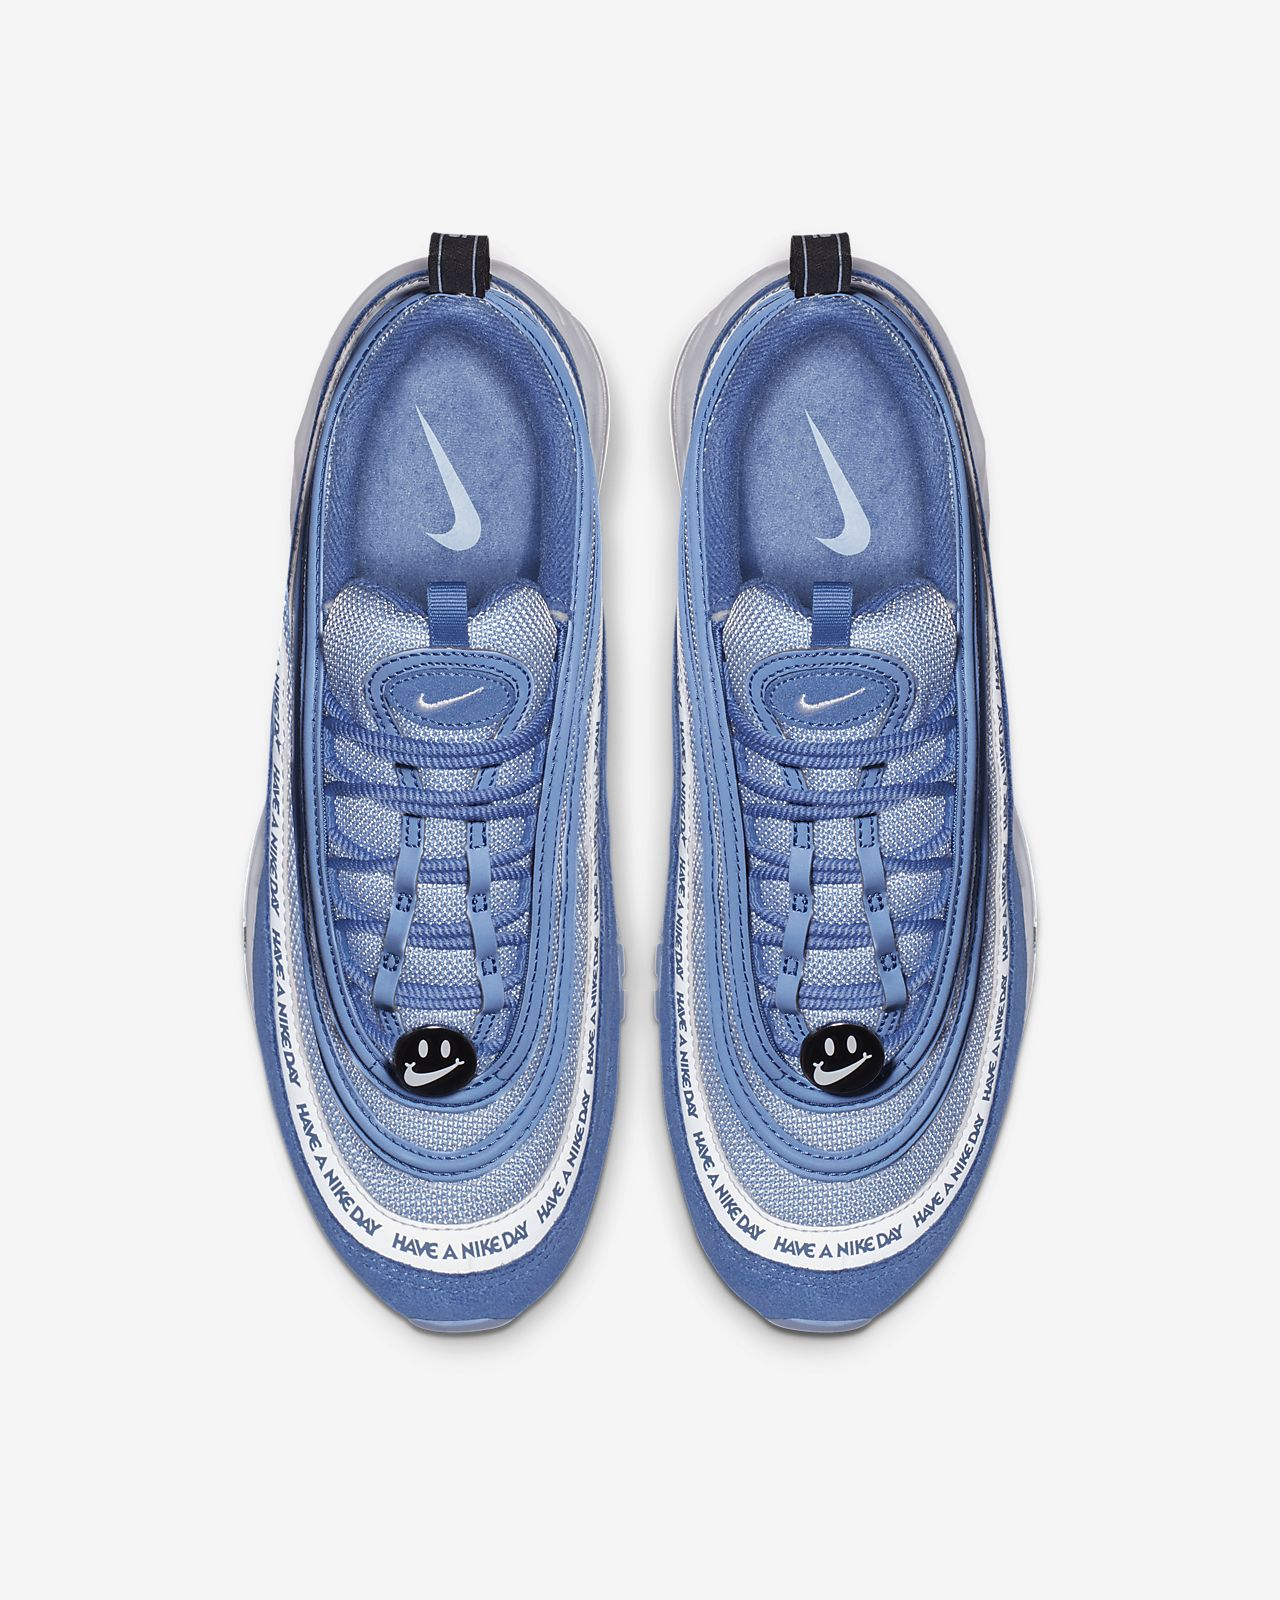 Nike Air Max 97 Ul '17 Se Women Shoes from Foot Locker.